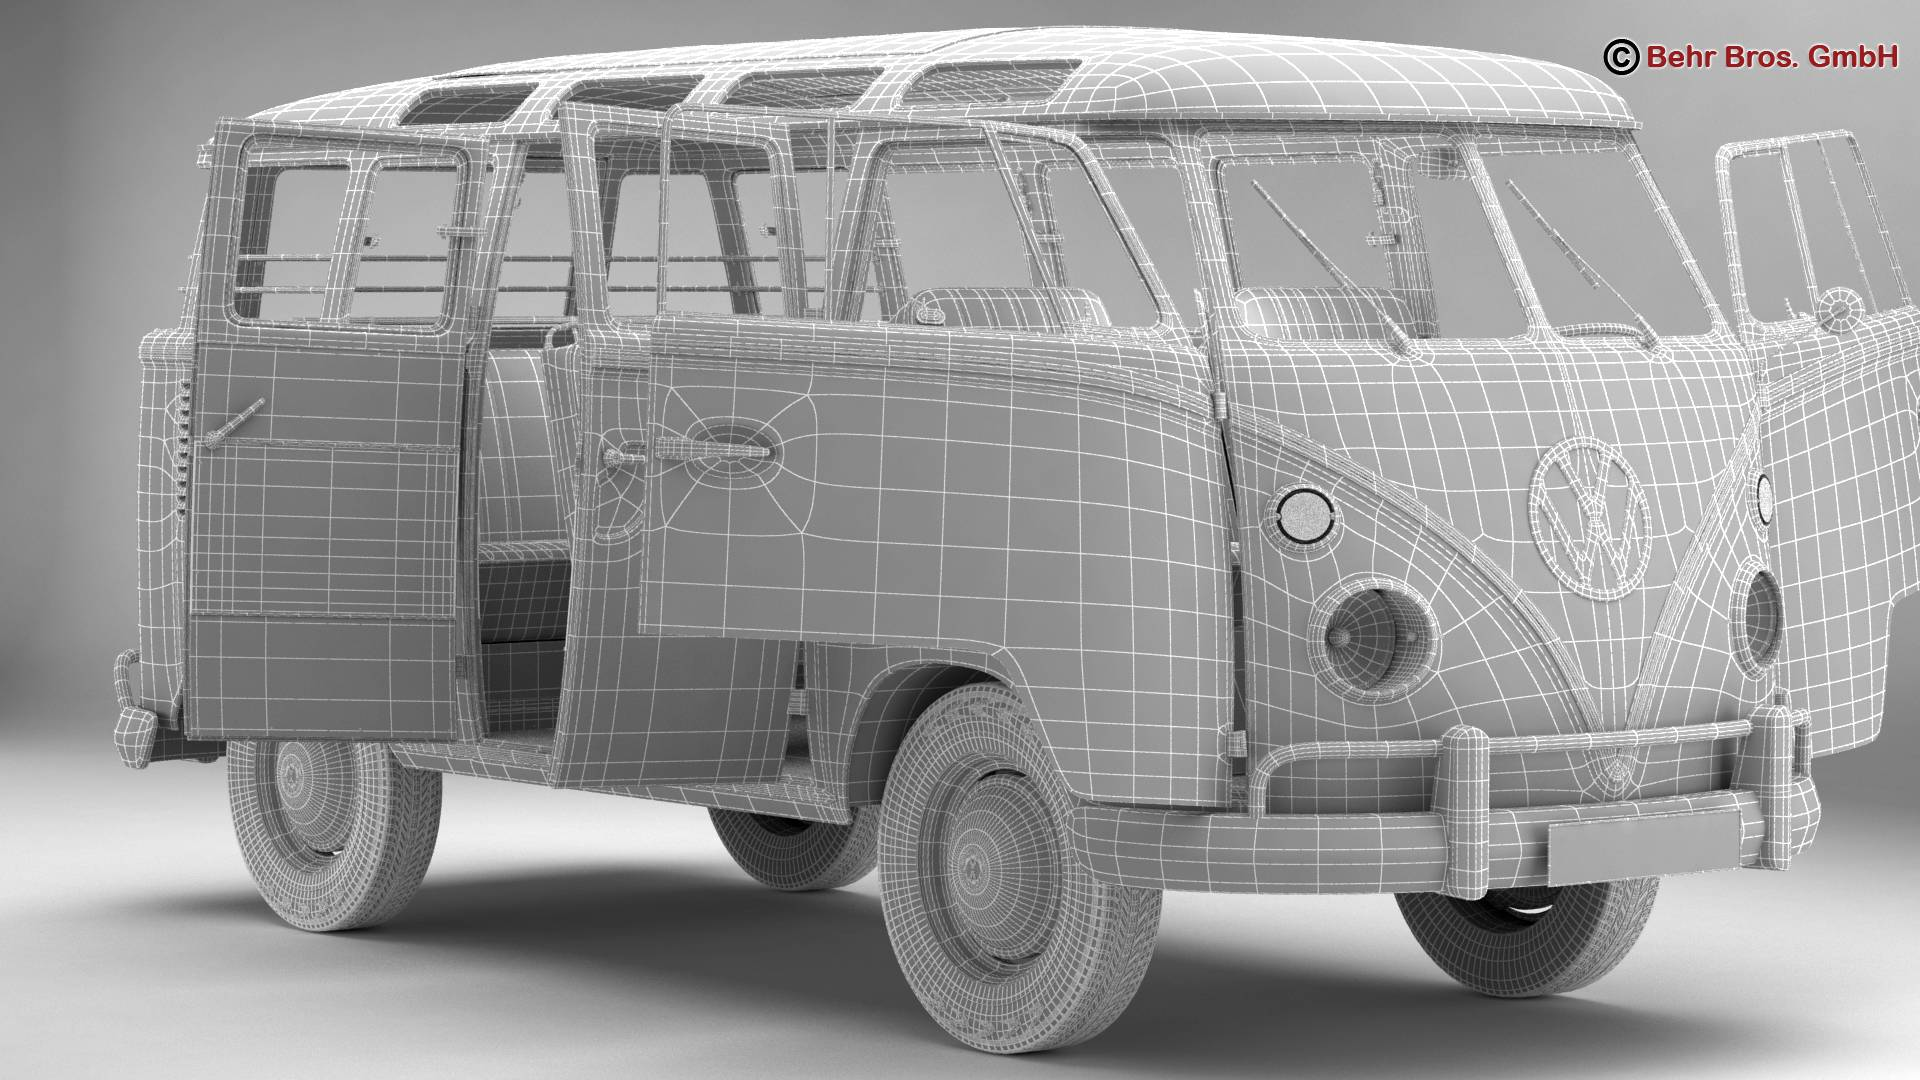 volkswagen type 2 samba 1963 hippie 3d model 3ds max fbx c4d lwo ma mb obj 217259